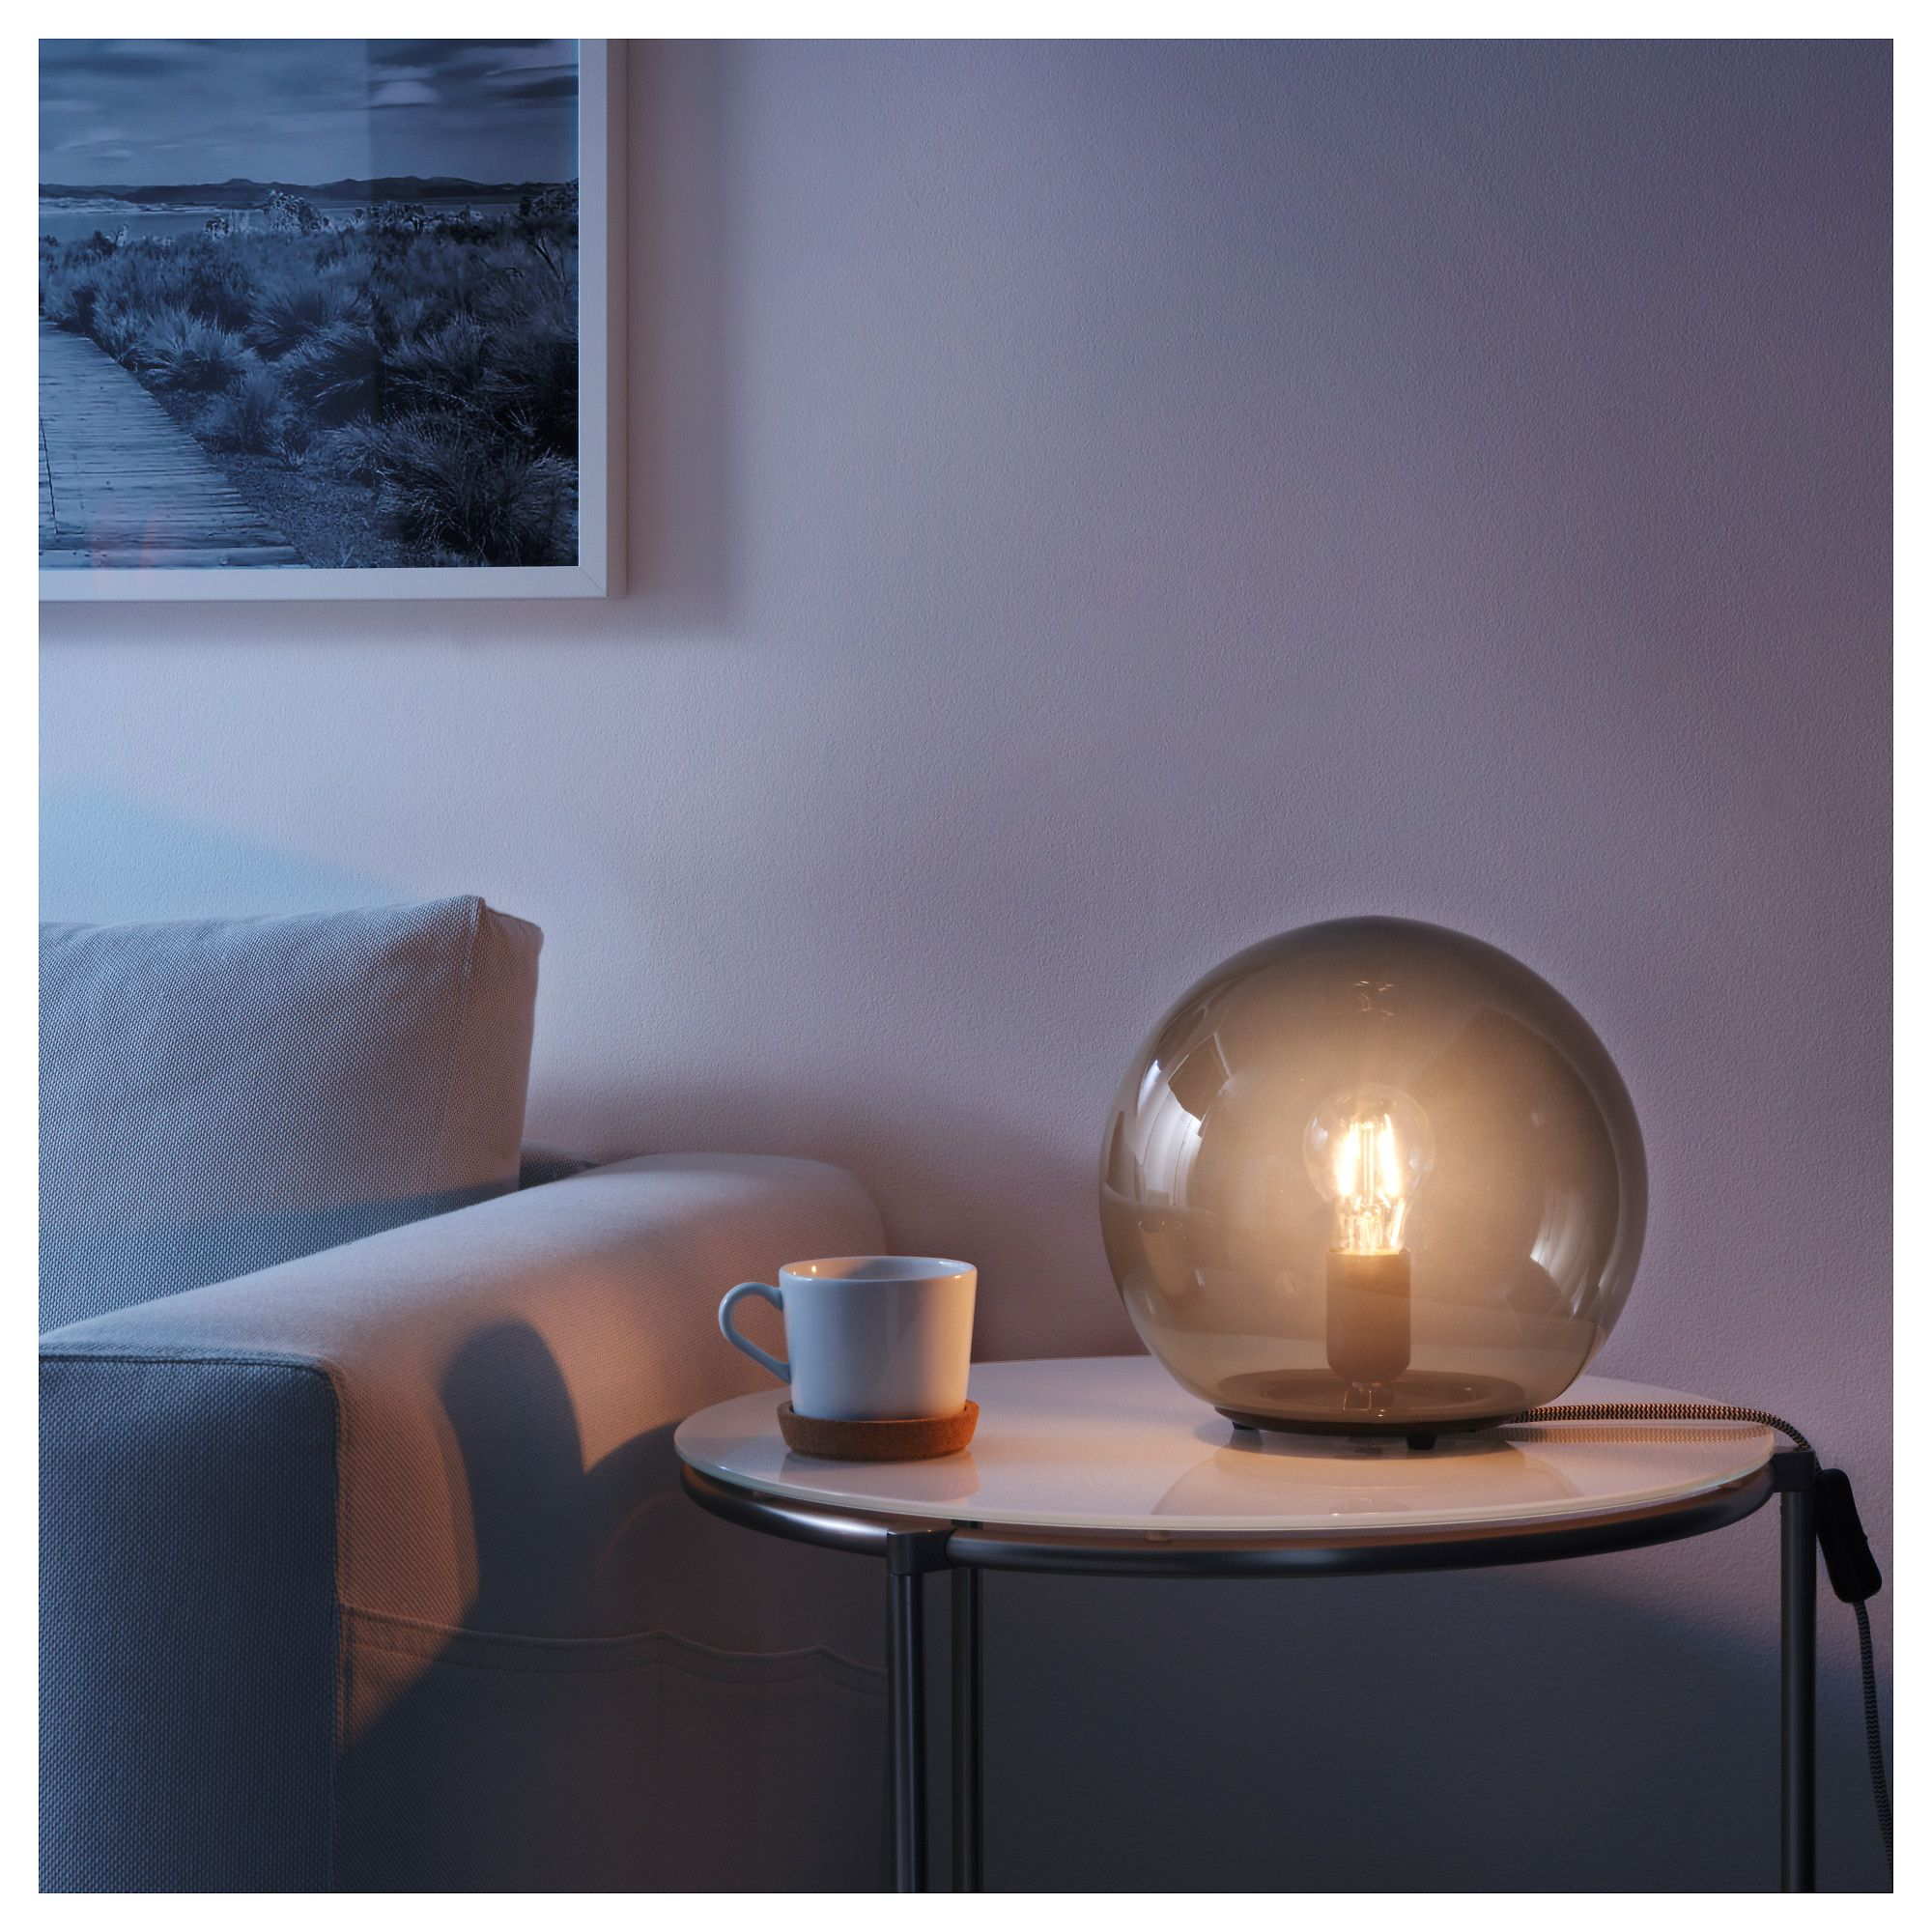 Fado Grey Table Lamp 25 Cm Ikea Lamps Living Room Table Top Lamps Grey Table Lamps